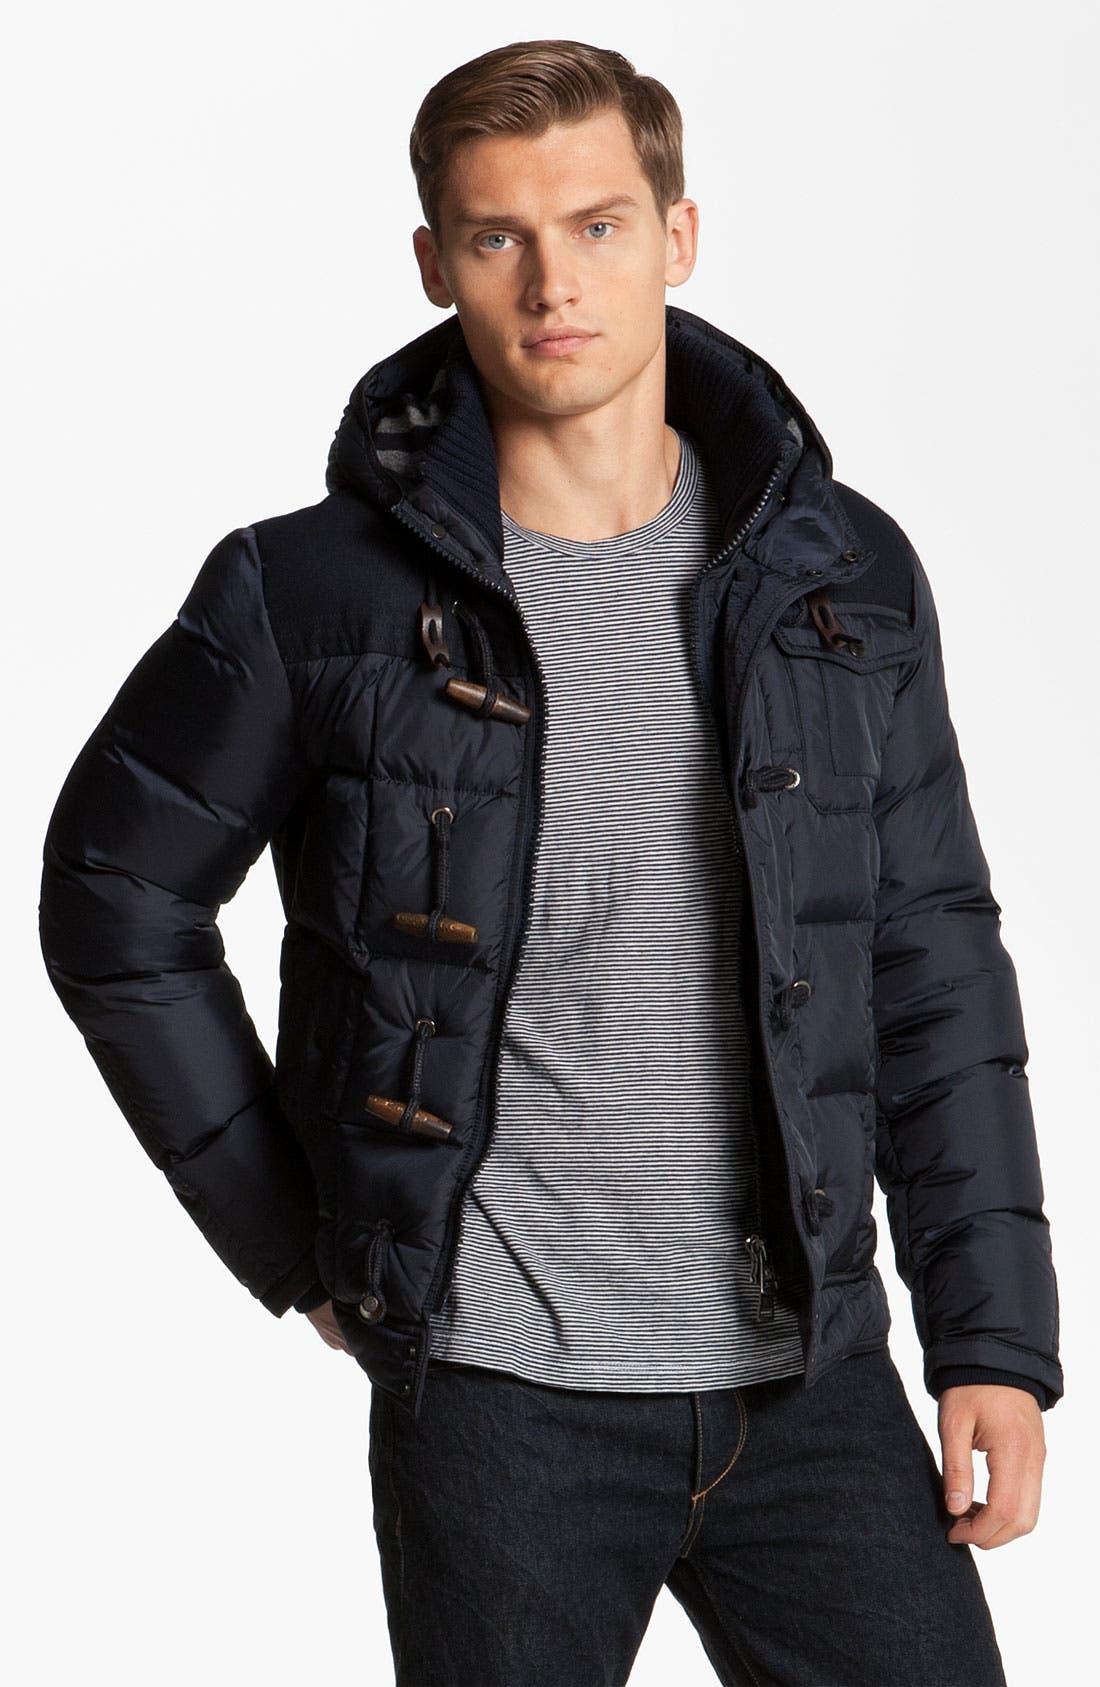 Alternate Image 1 Selected - Moncler 'Virgile' Hooded Quilted Bomber Jacket